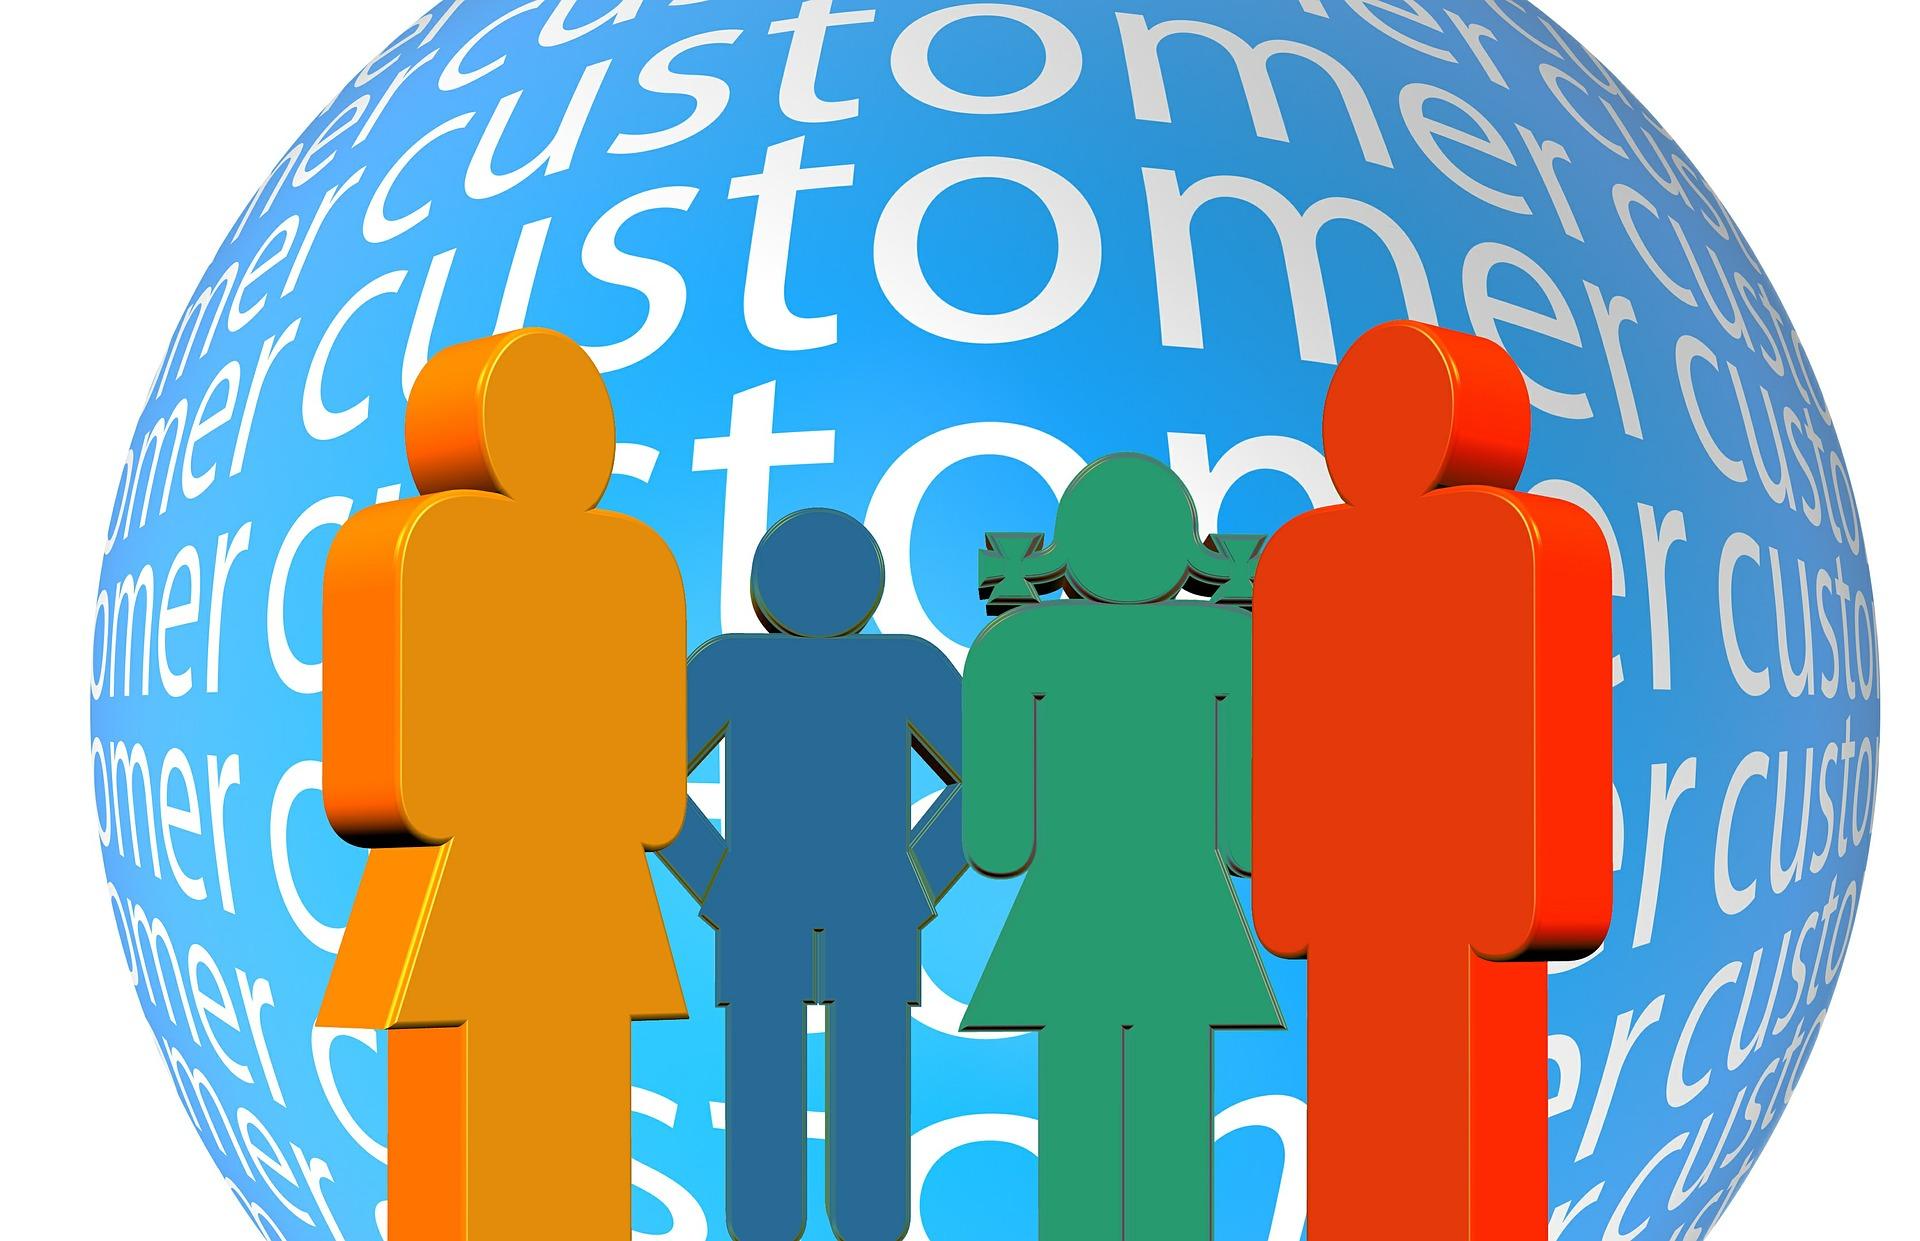 Client Testimonials - Click Below to Read